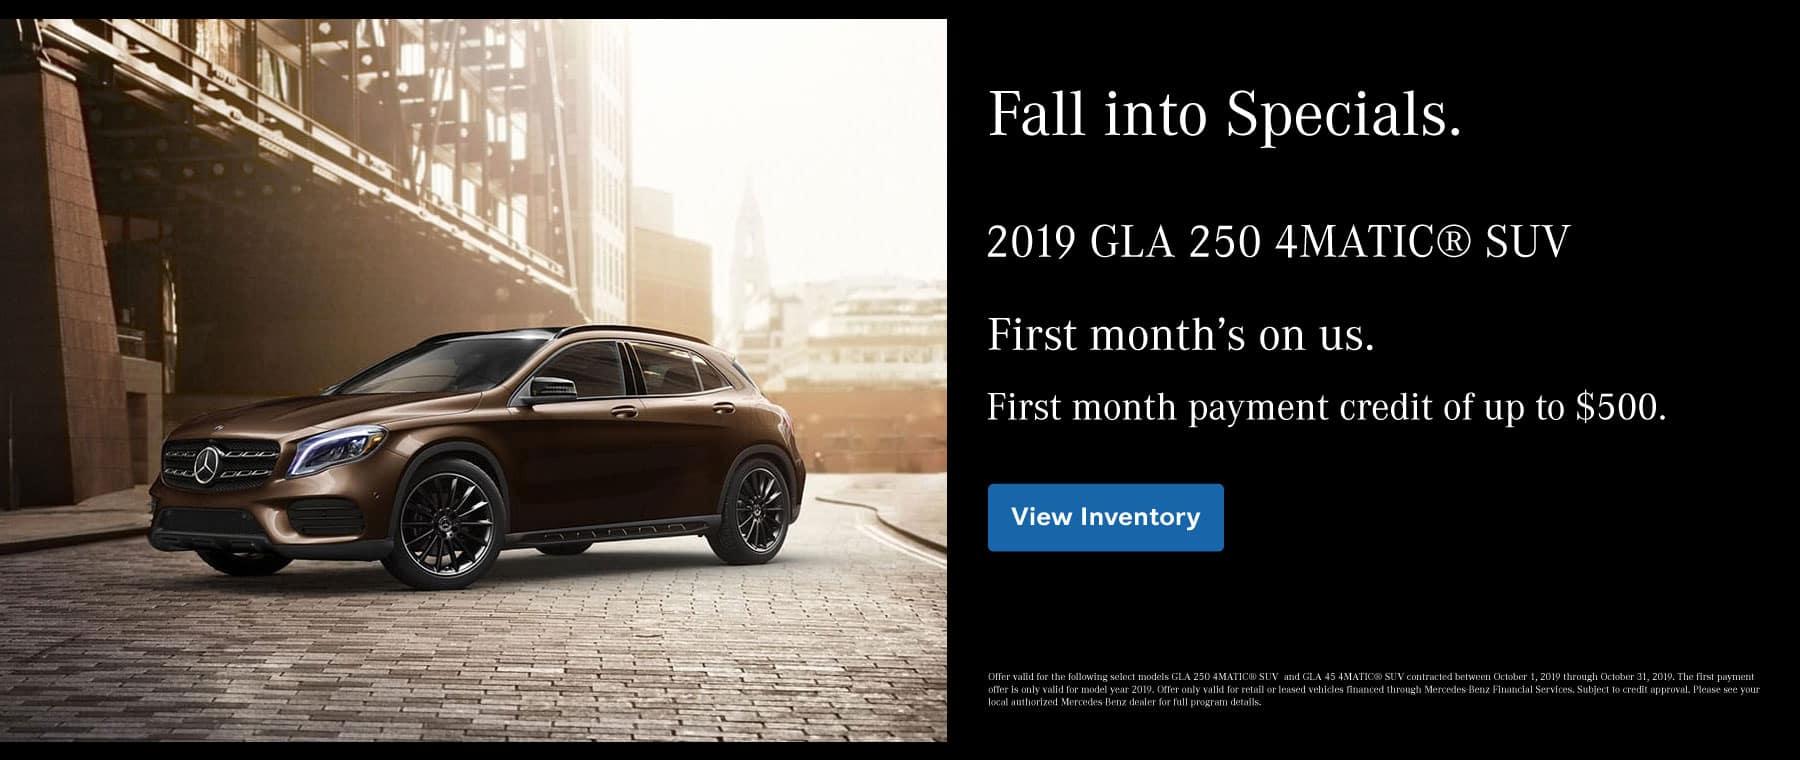 2019 GLA 250 Payment Credit